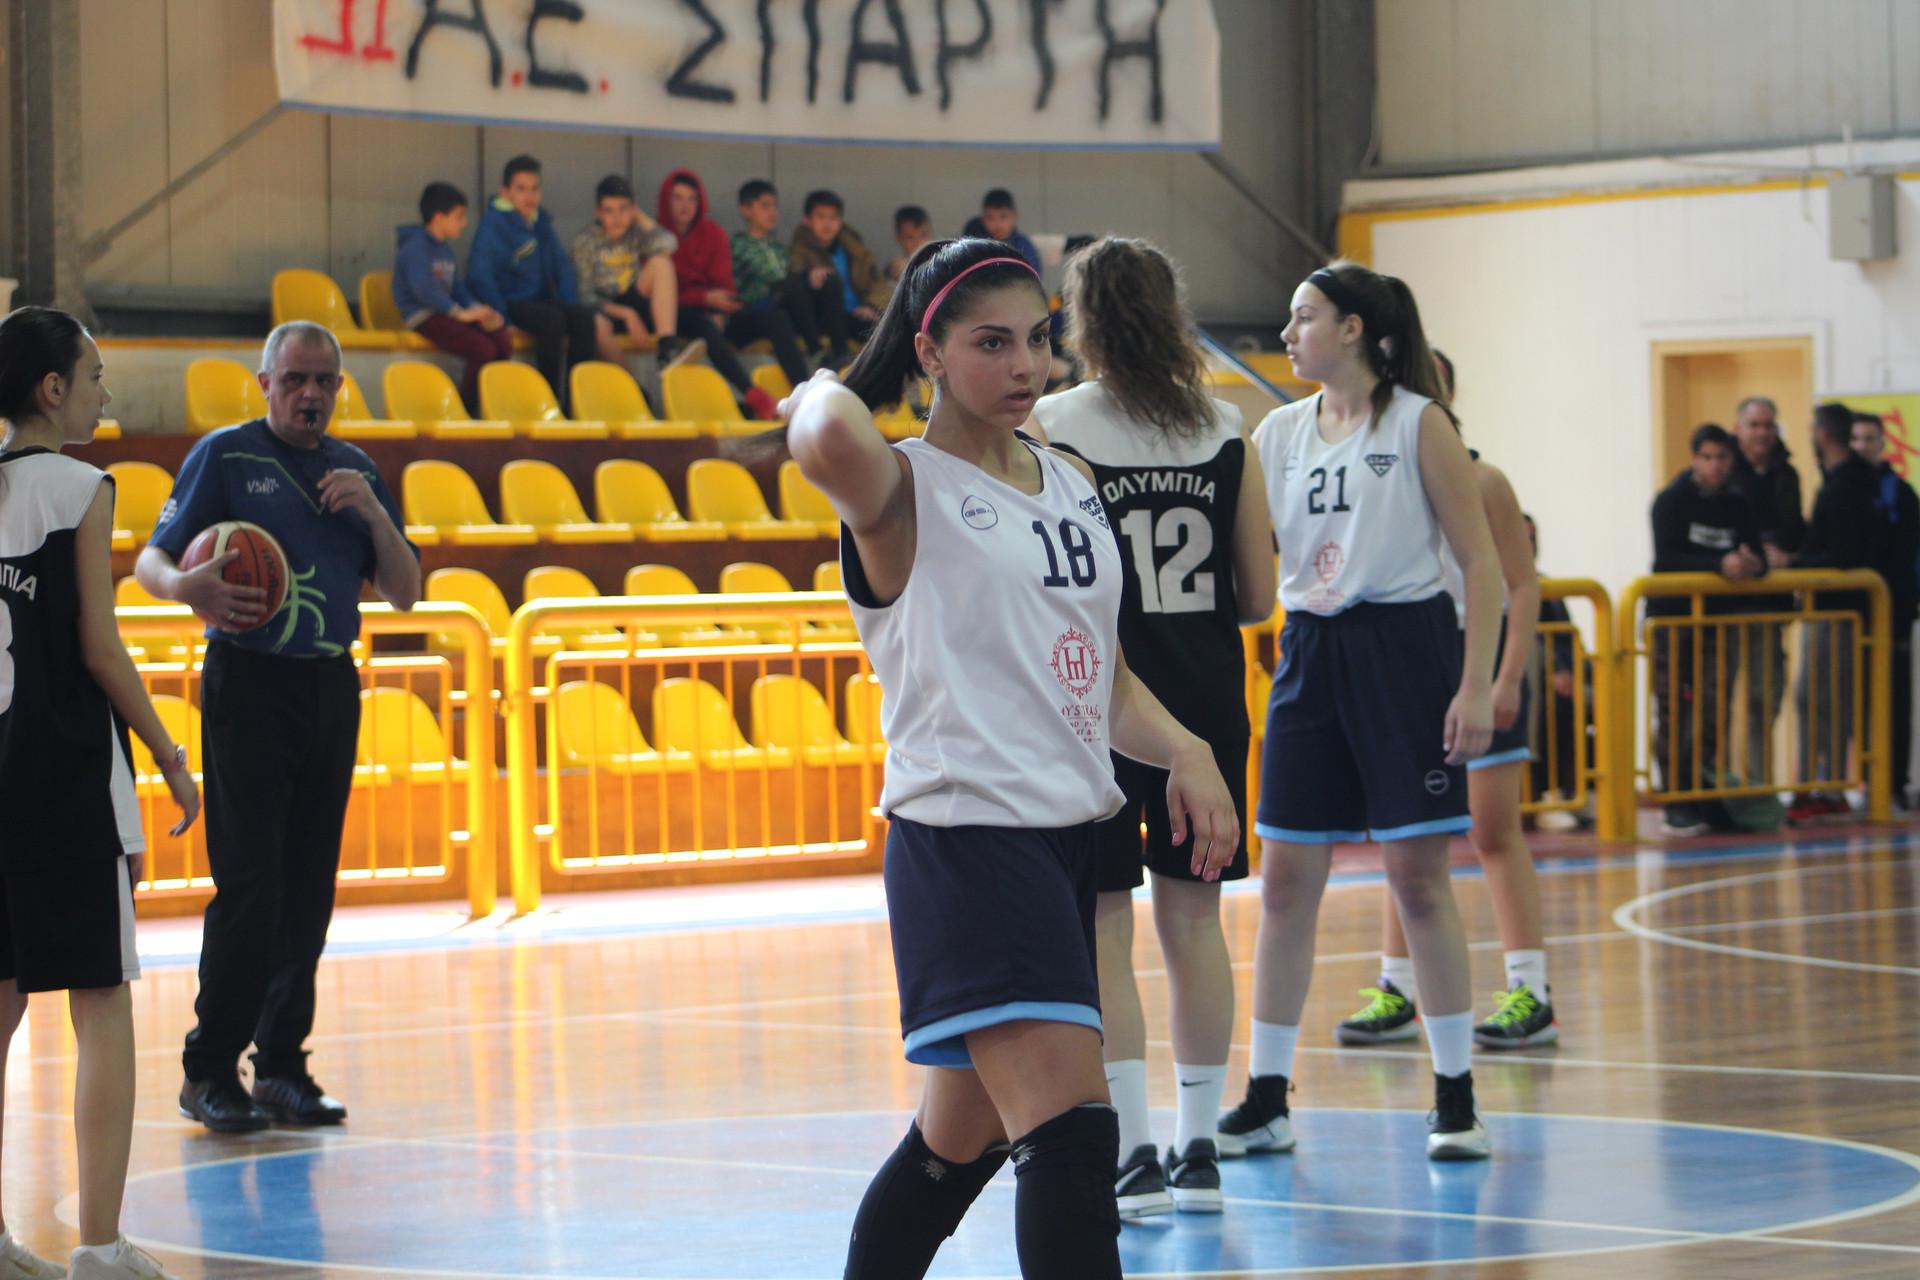 super-league-athletic-academy-athens-tour-2019-day-1_46762667055_o